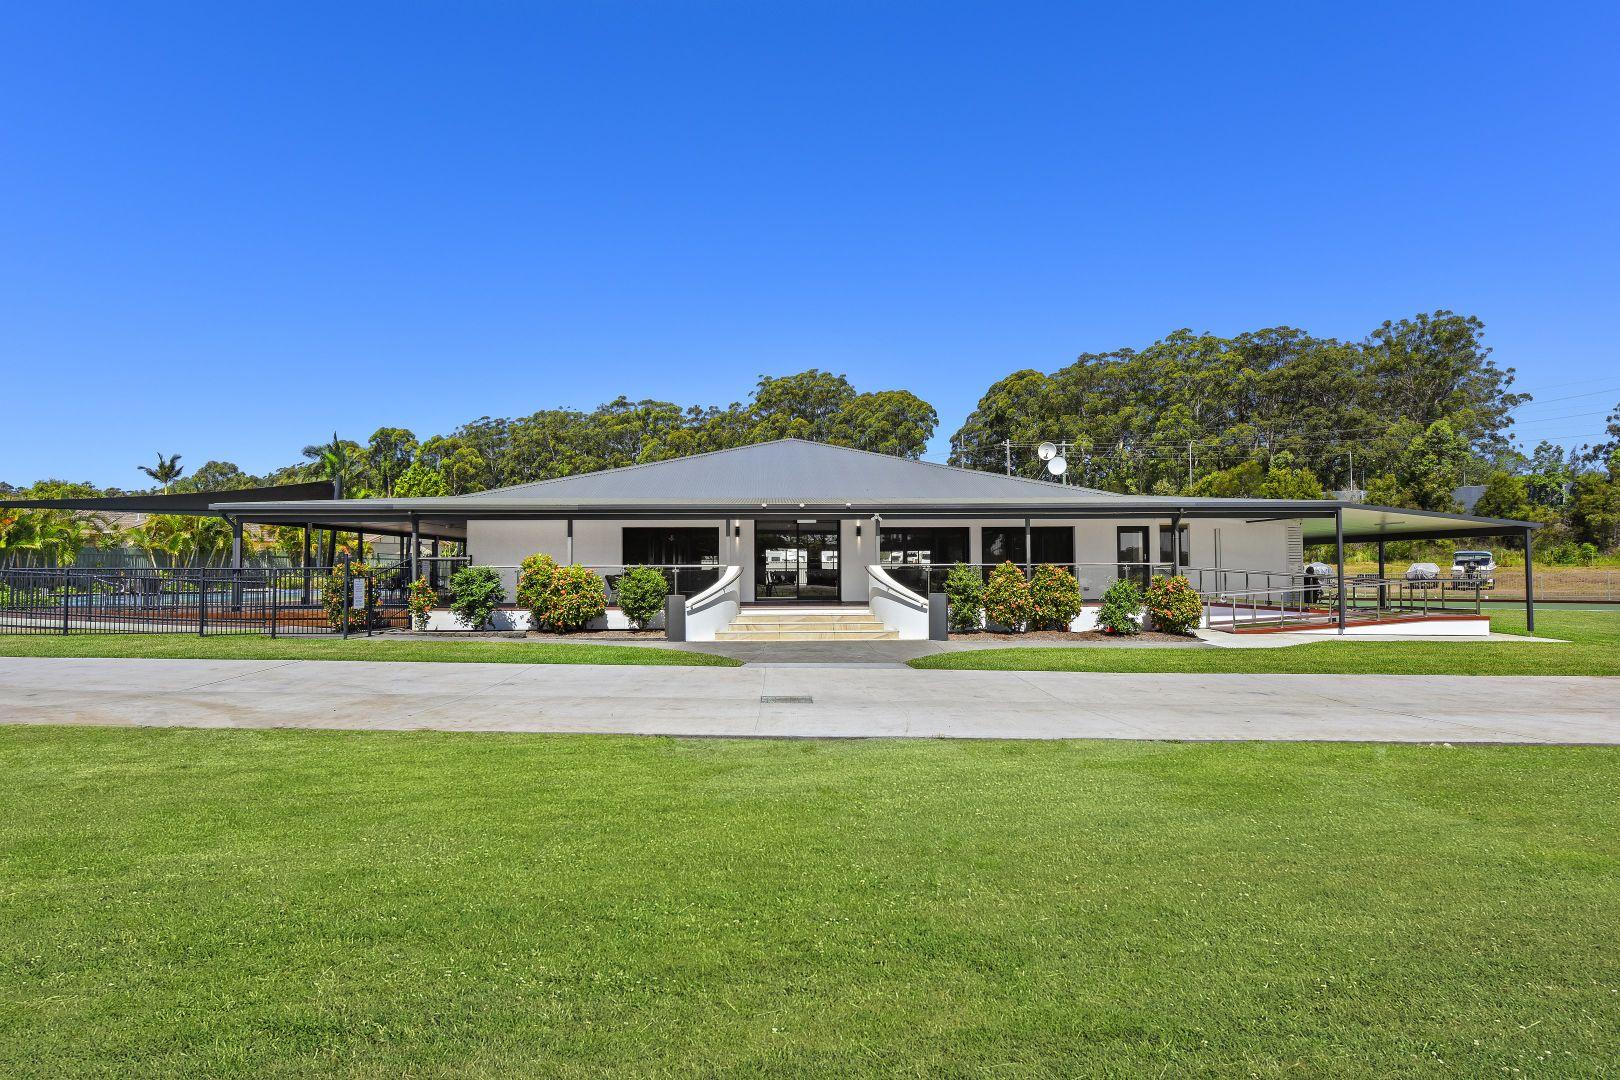 1A Lincoln Road, Port Macquarie, NSW 2444, Image 0